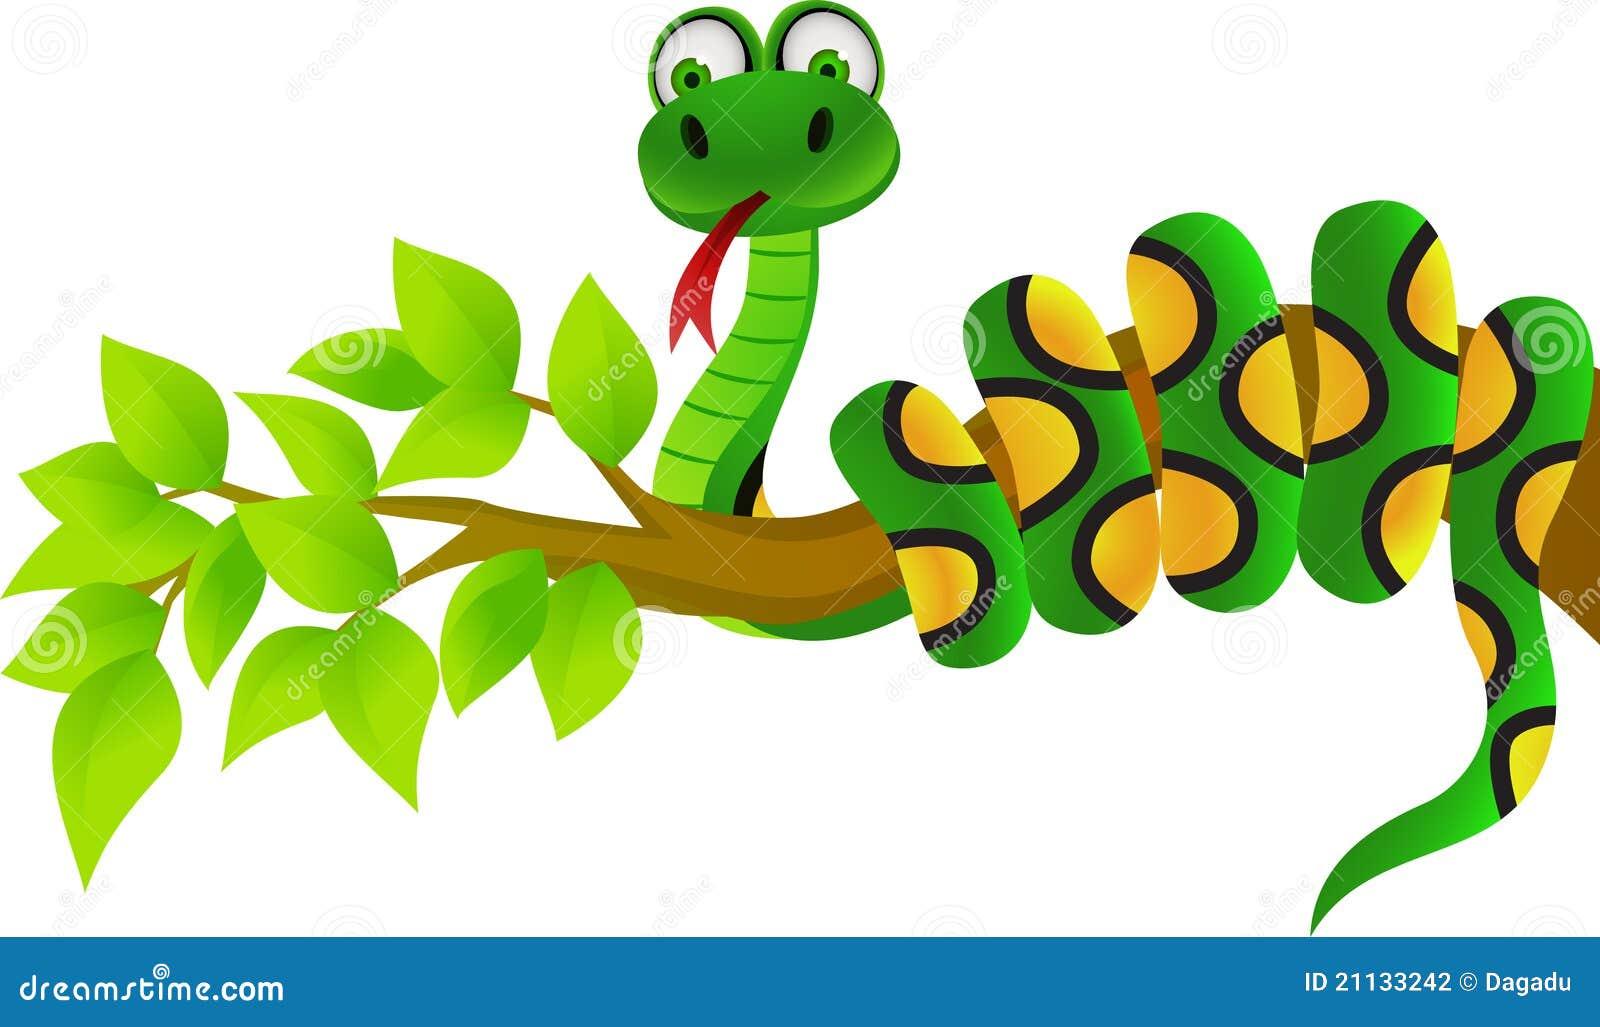 Green snake cartoon royalty free stock image image 19462406 - Snake Cartoon Stock Funny Snake Cartoon